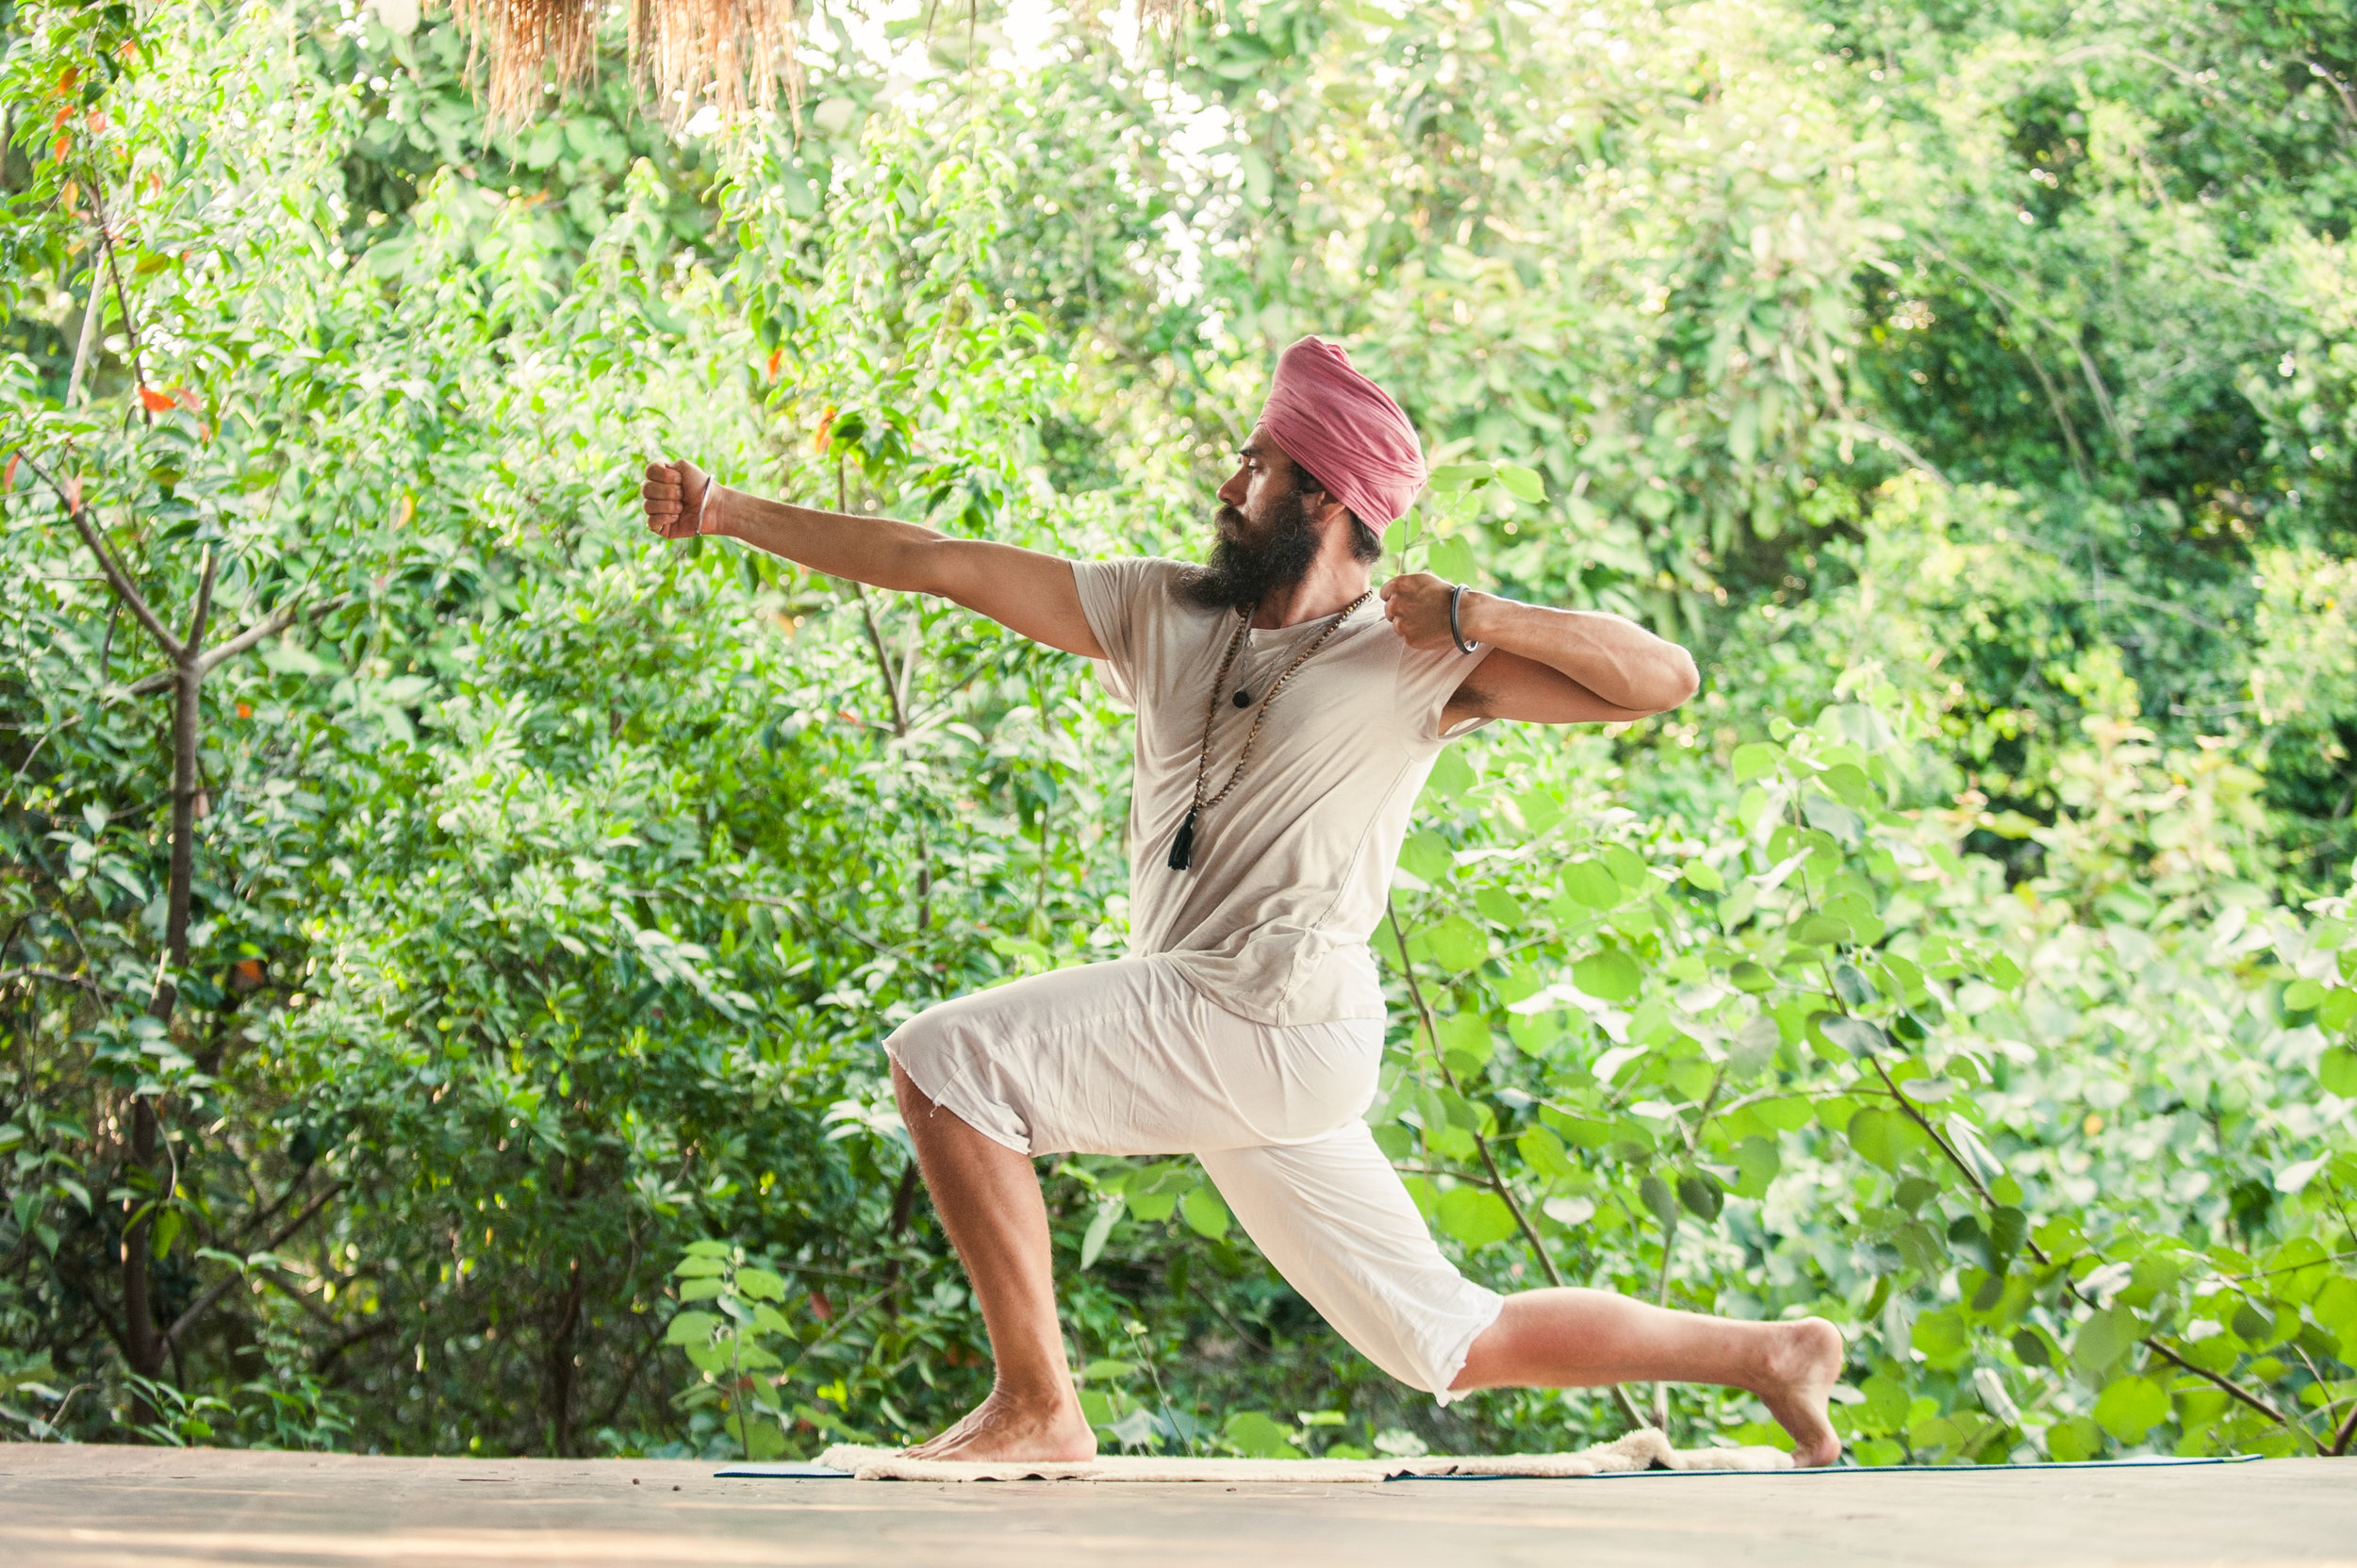 Man-to-Man Kundalini Yoga with Hari Karam Singh